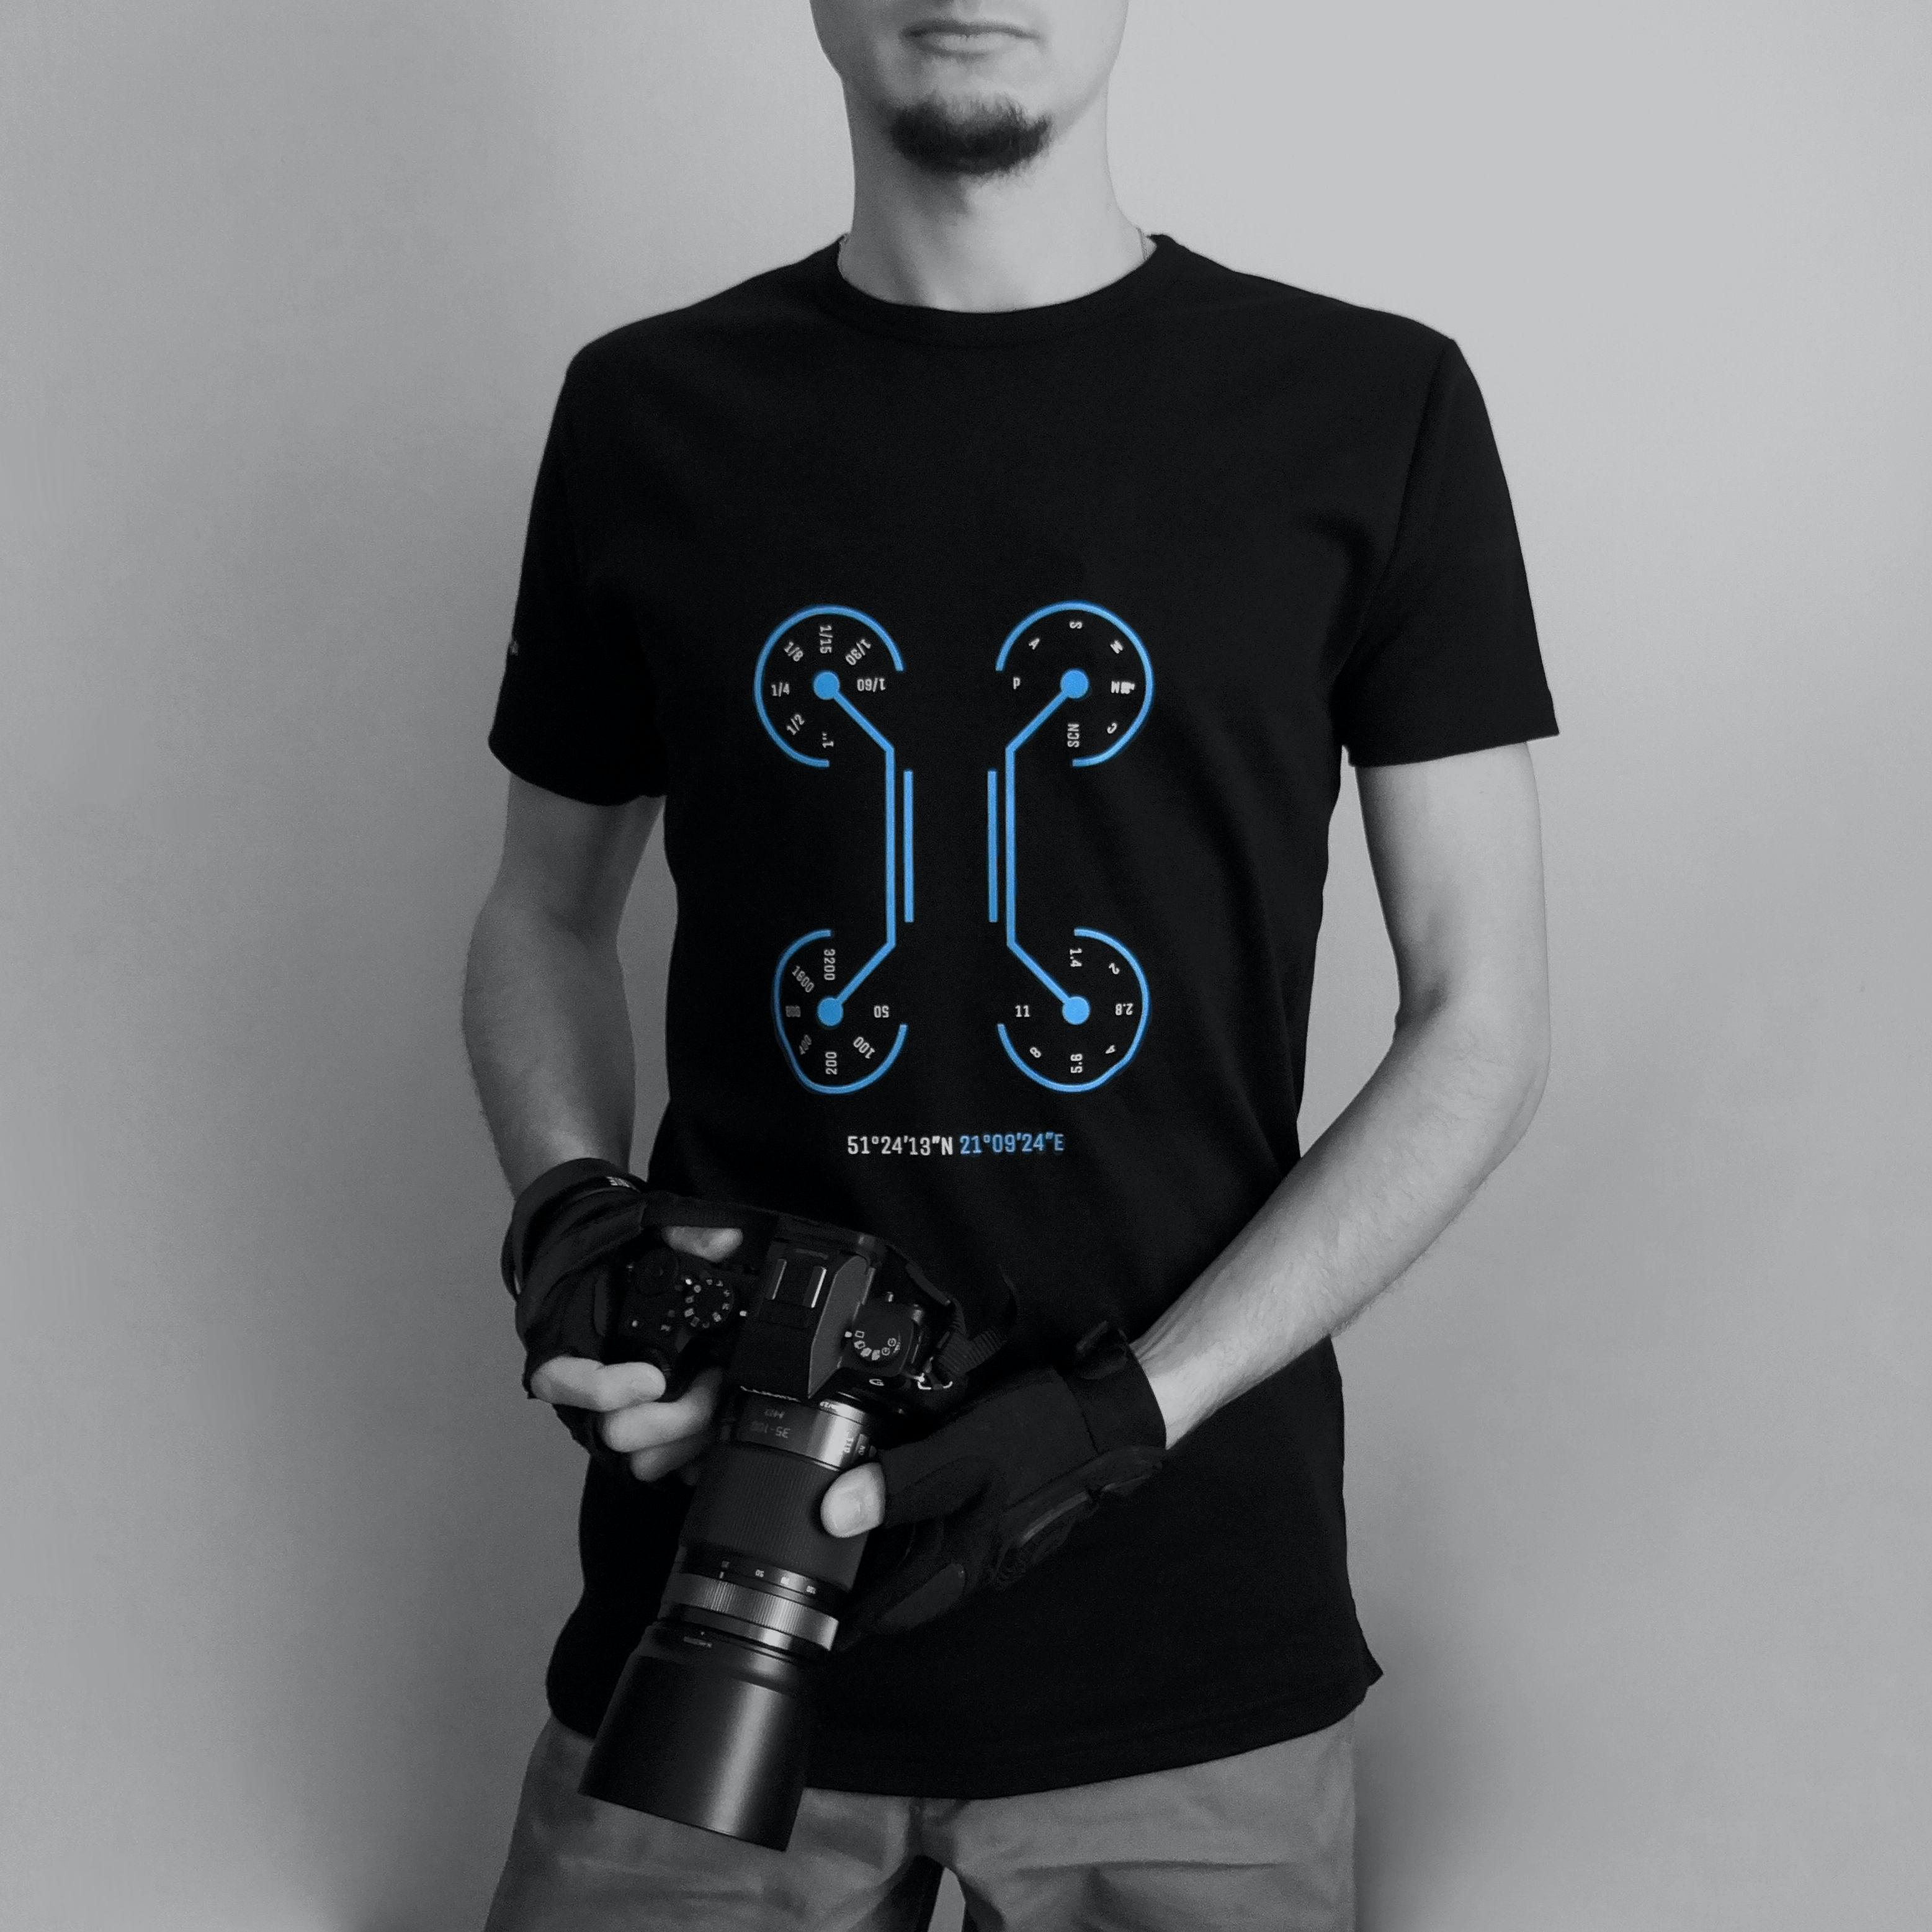 Go to Michał Bożek's profile